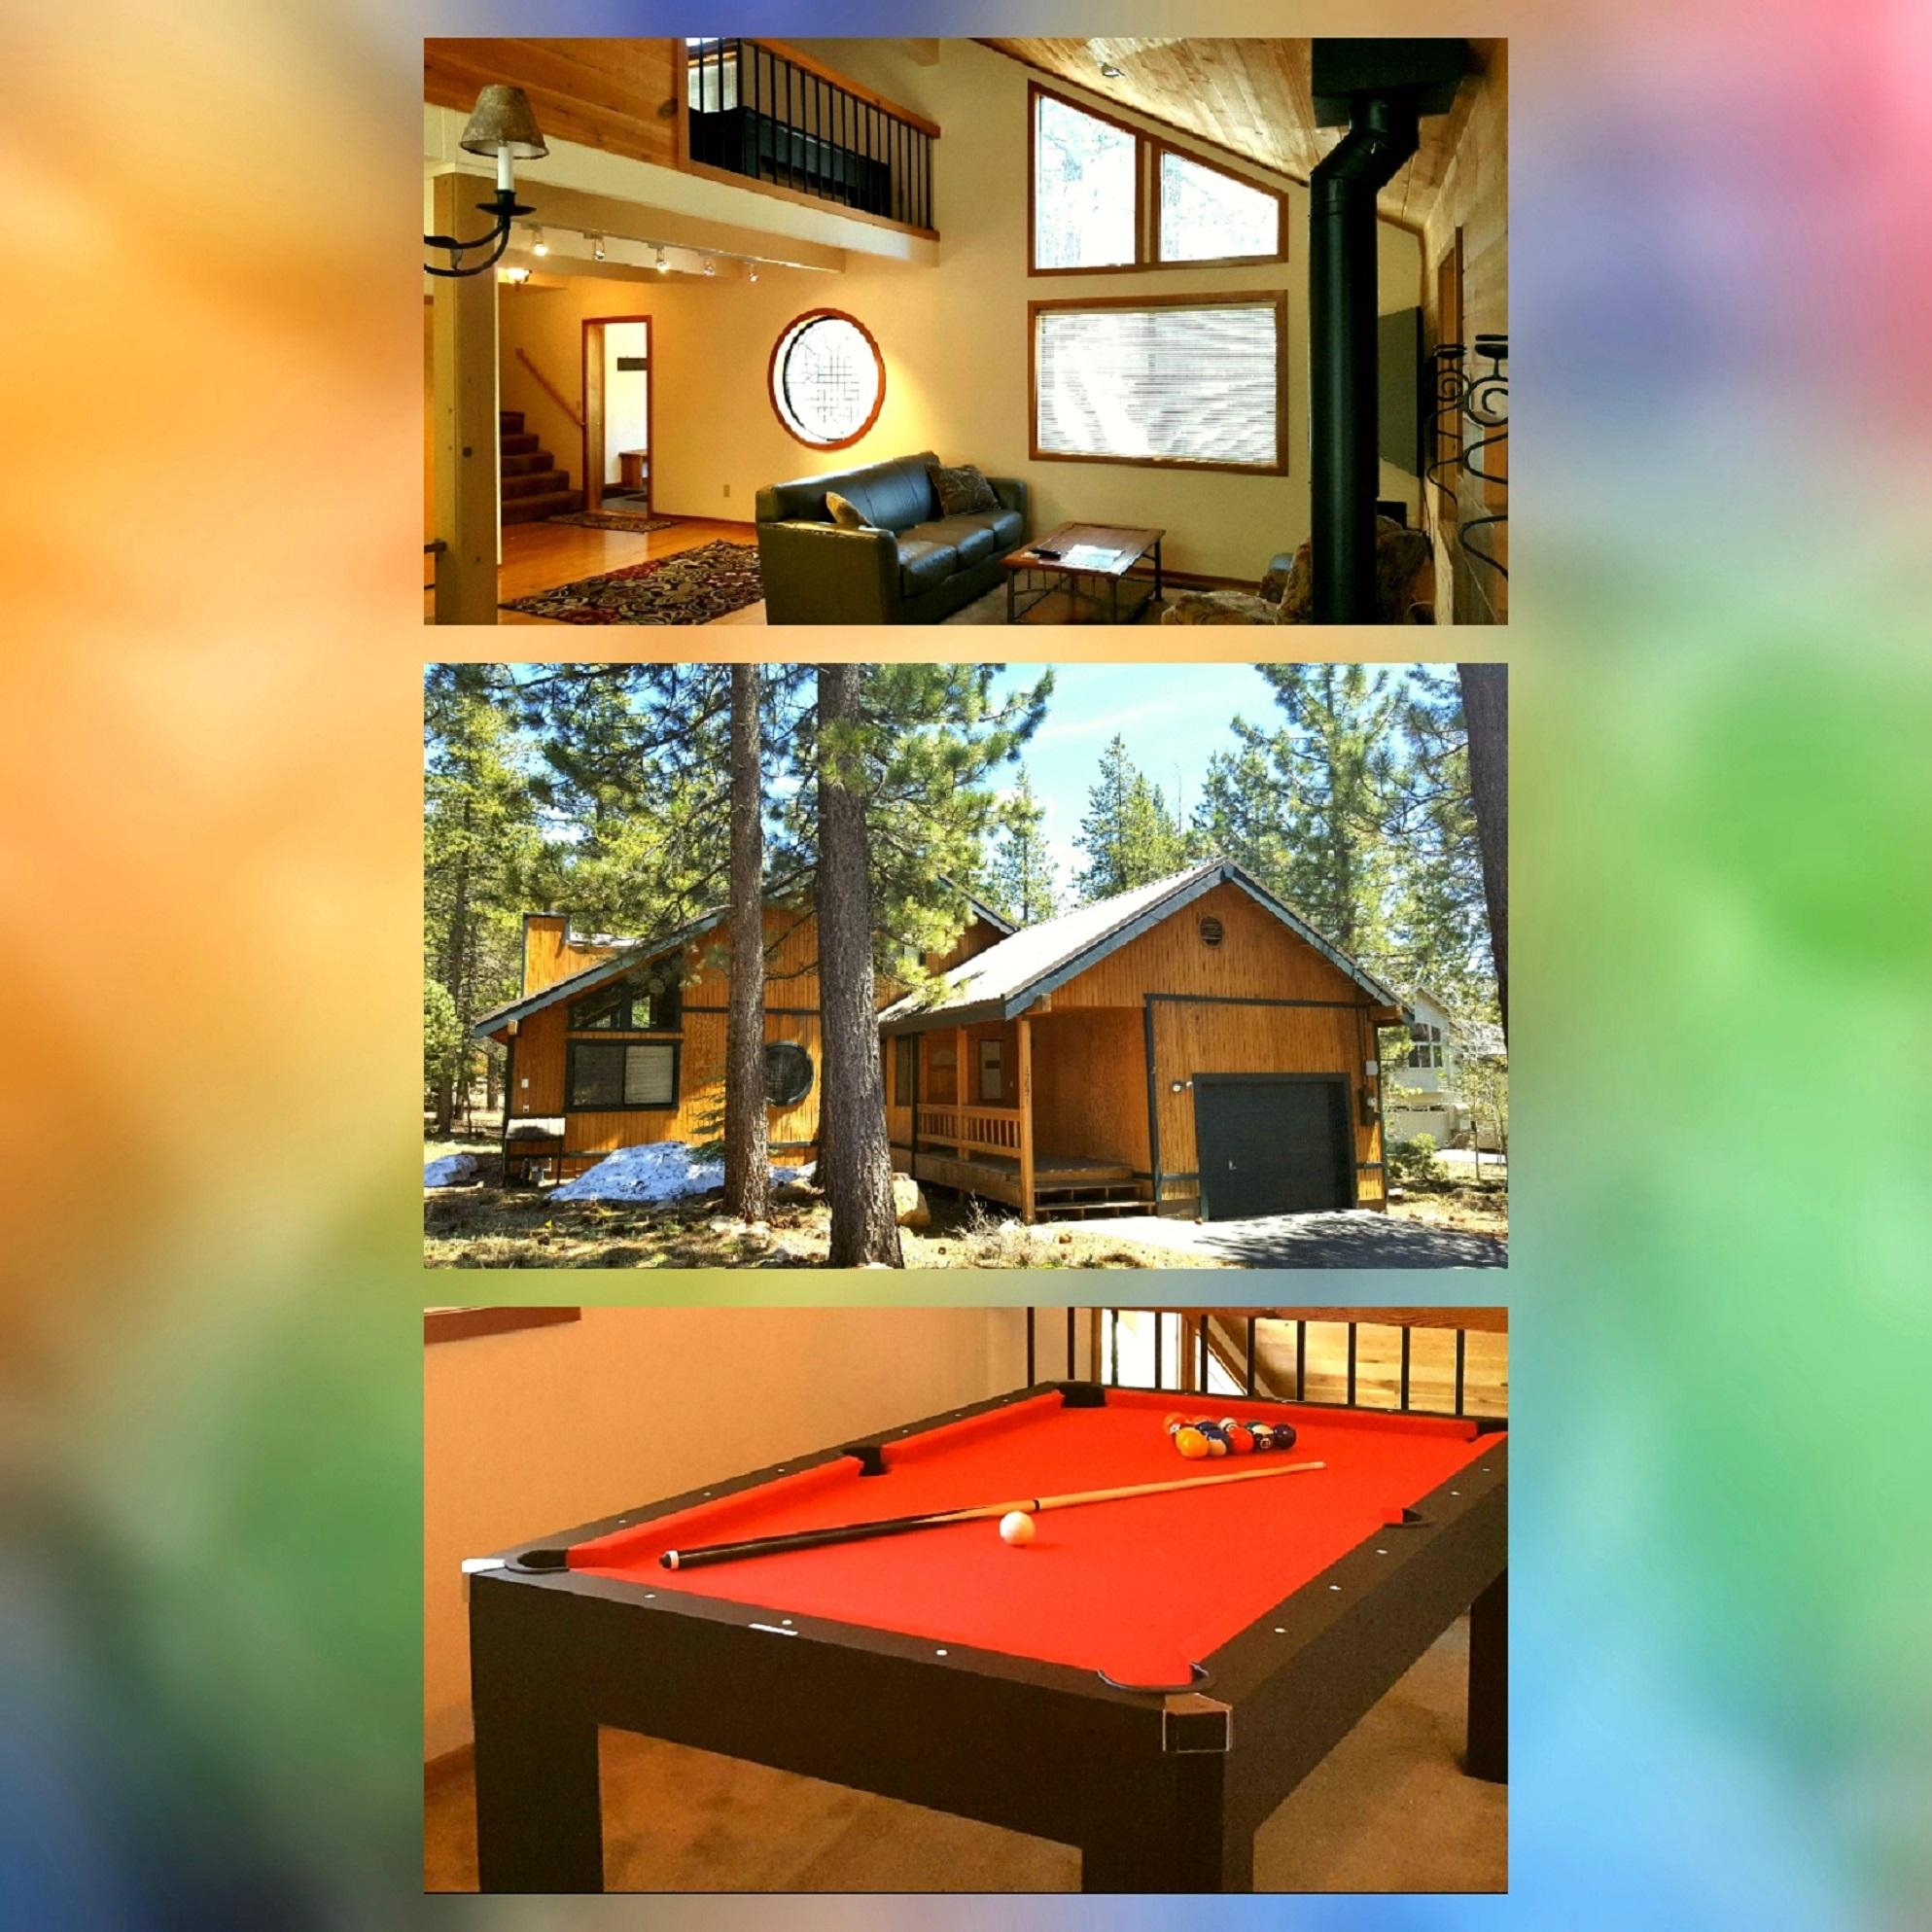 retreat vacation cabins lake rental rentals rustic tahoe